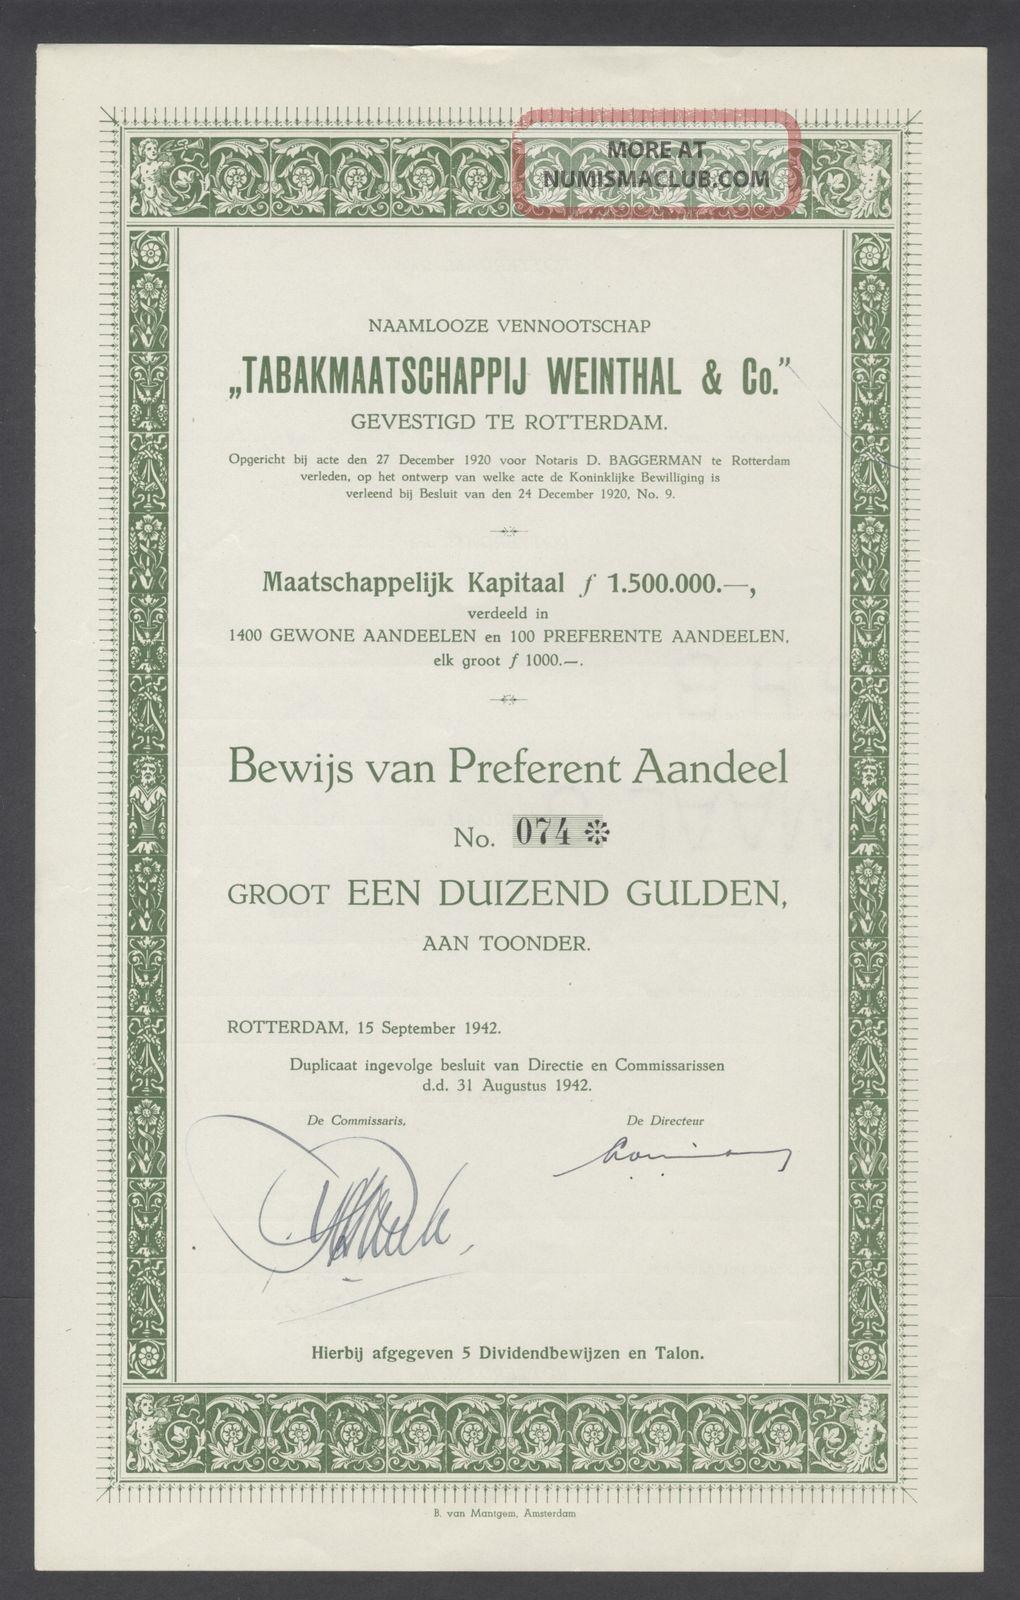 Netherlands 1942 Bond - Tabakmaatschappij Weinthal Rotterdam - Tobacco.  B1546 World photo